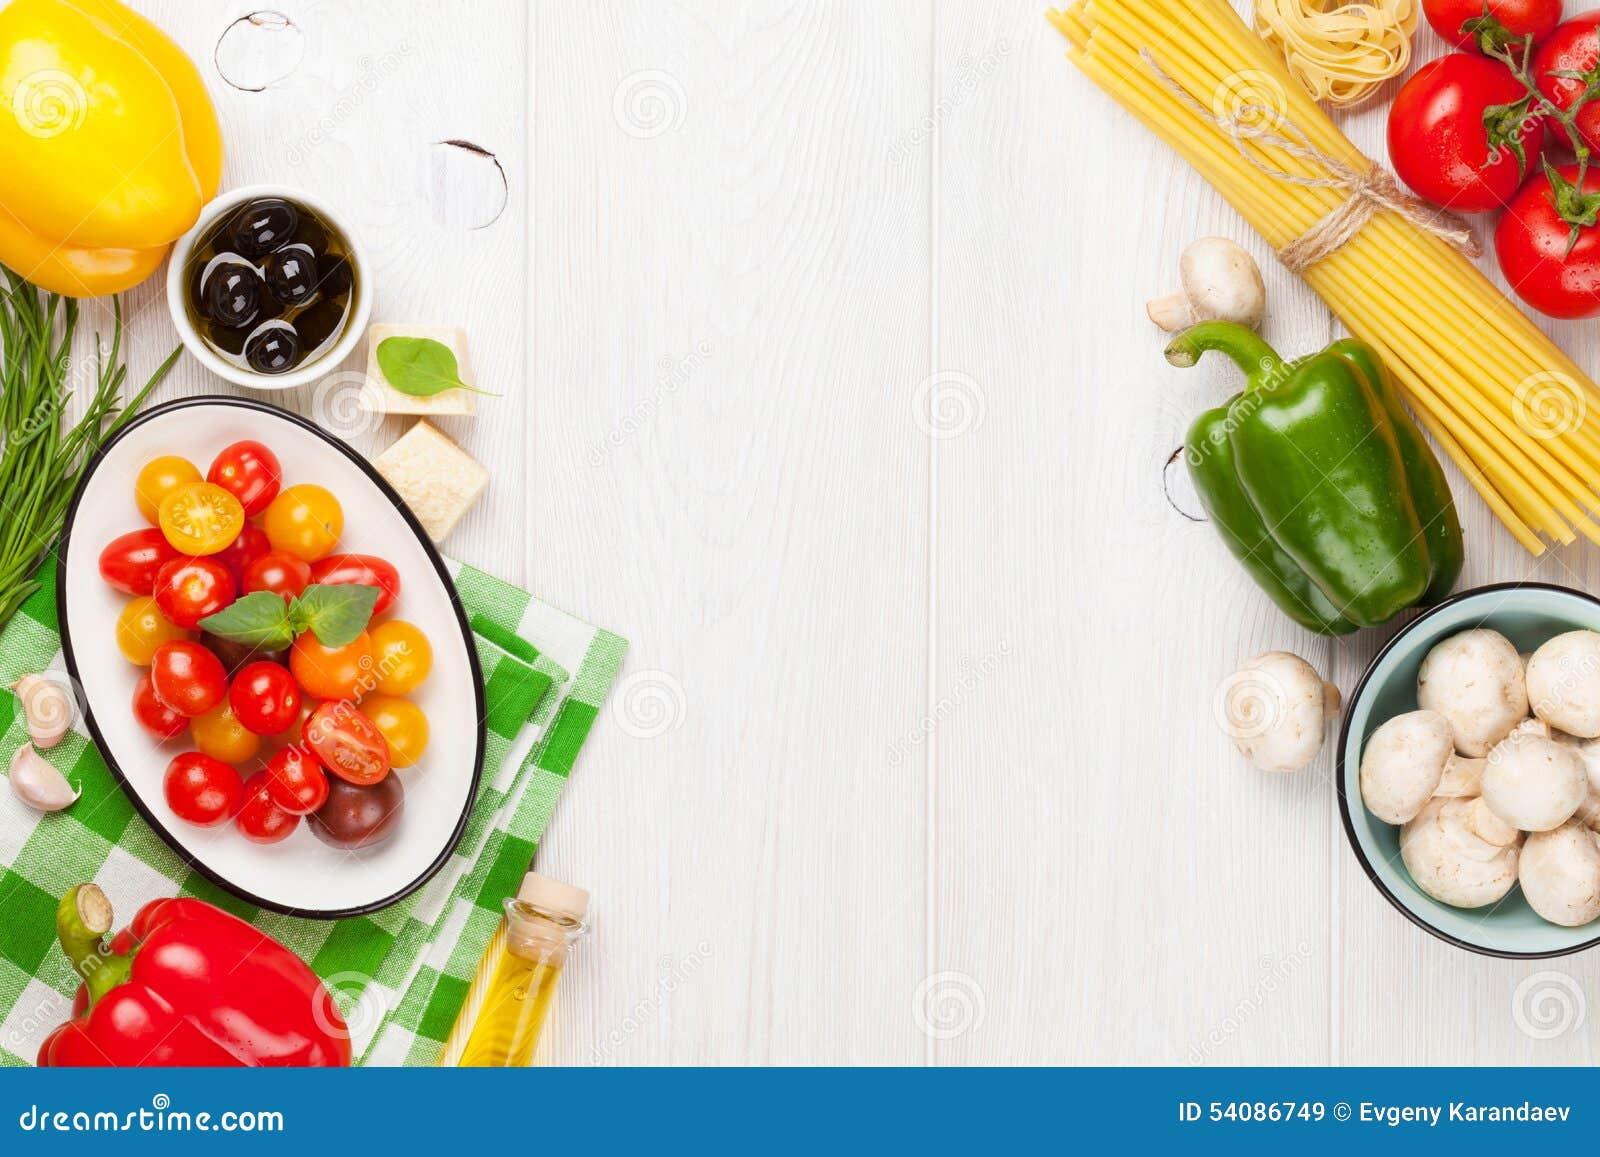 Italian food cooking ingredients pasta vegetables spices stock italian food cooking ingredients pasta vegetables spices stock image image of cherry cuisine 54086749 forumfinder Images